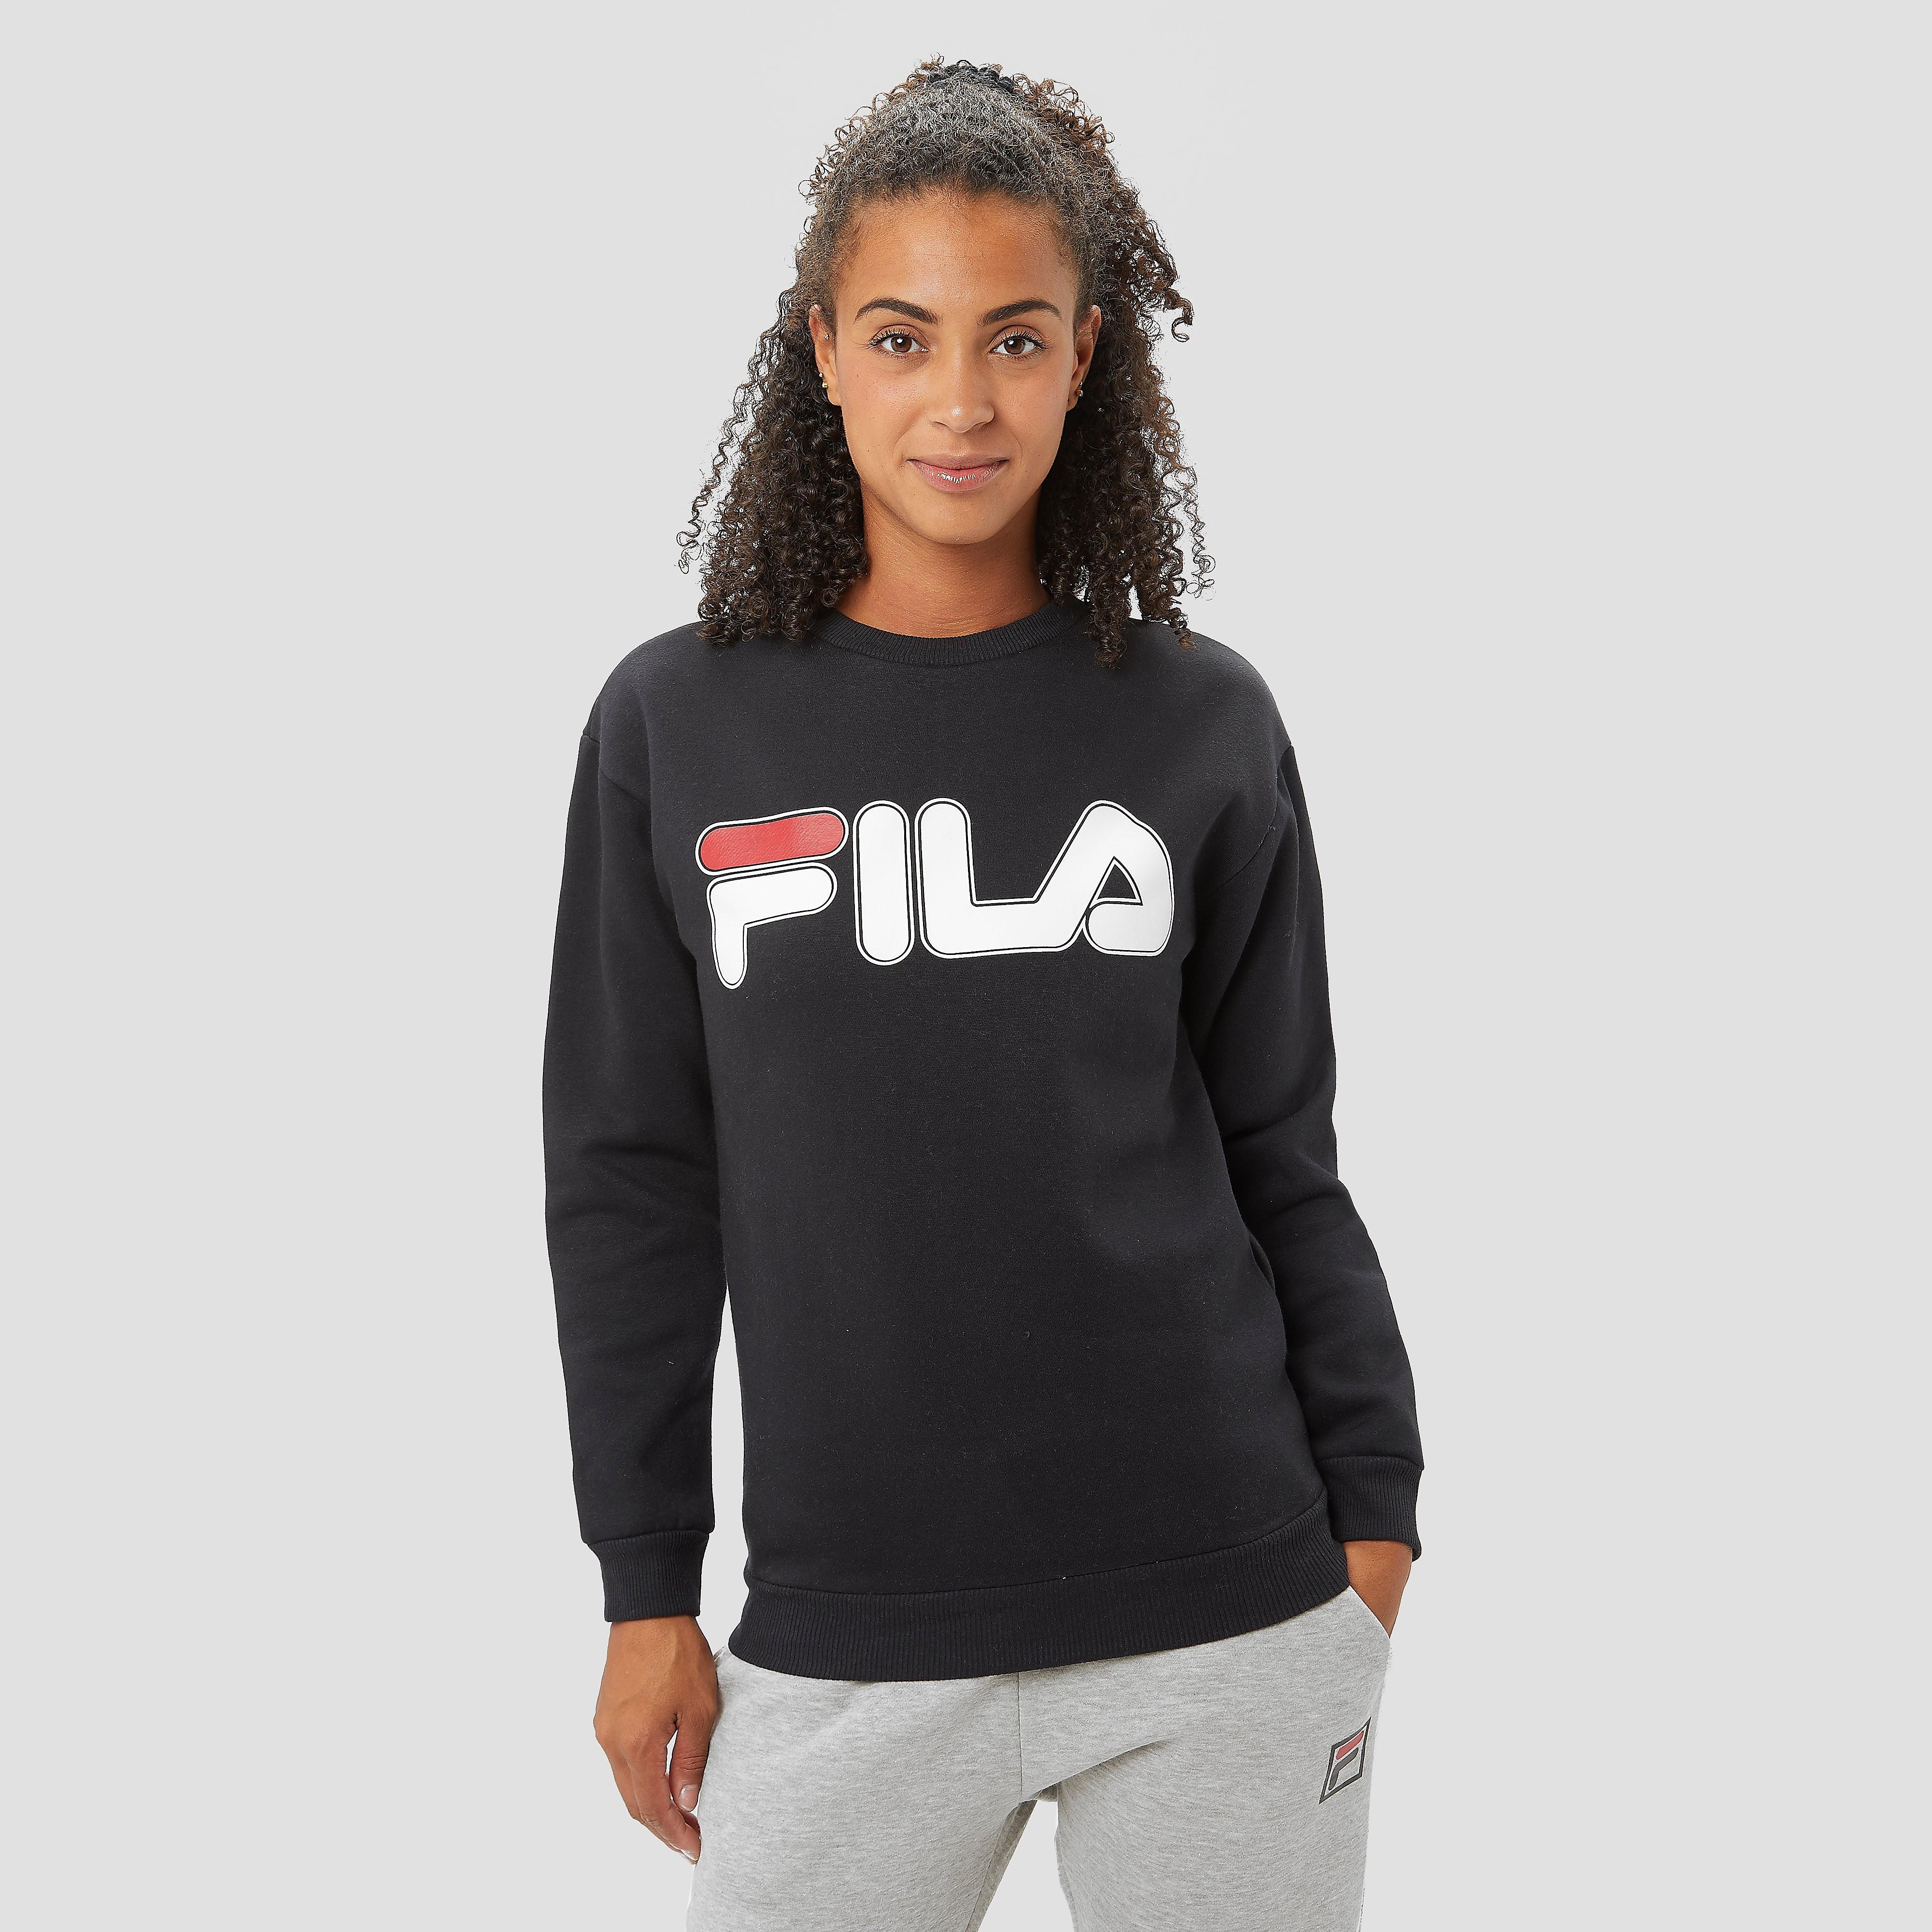 FILA Cydonia 2 crew sweater zwart dames Dames